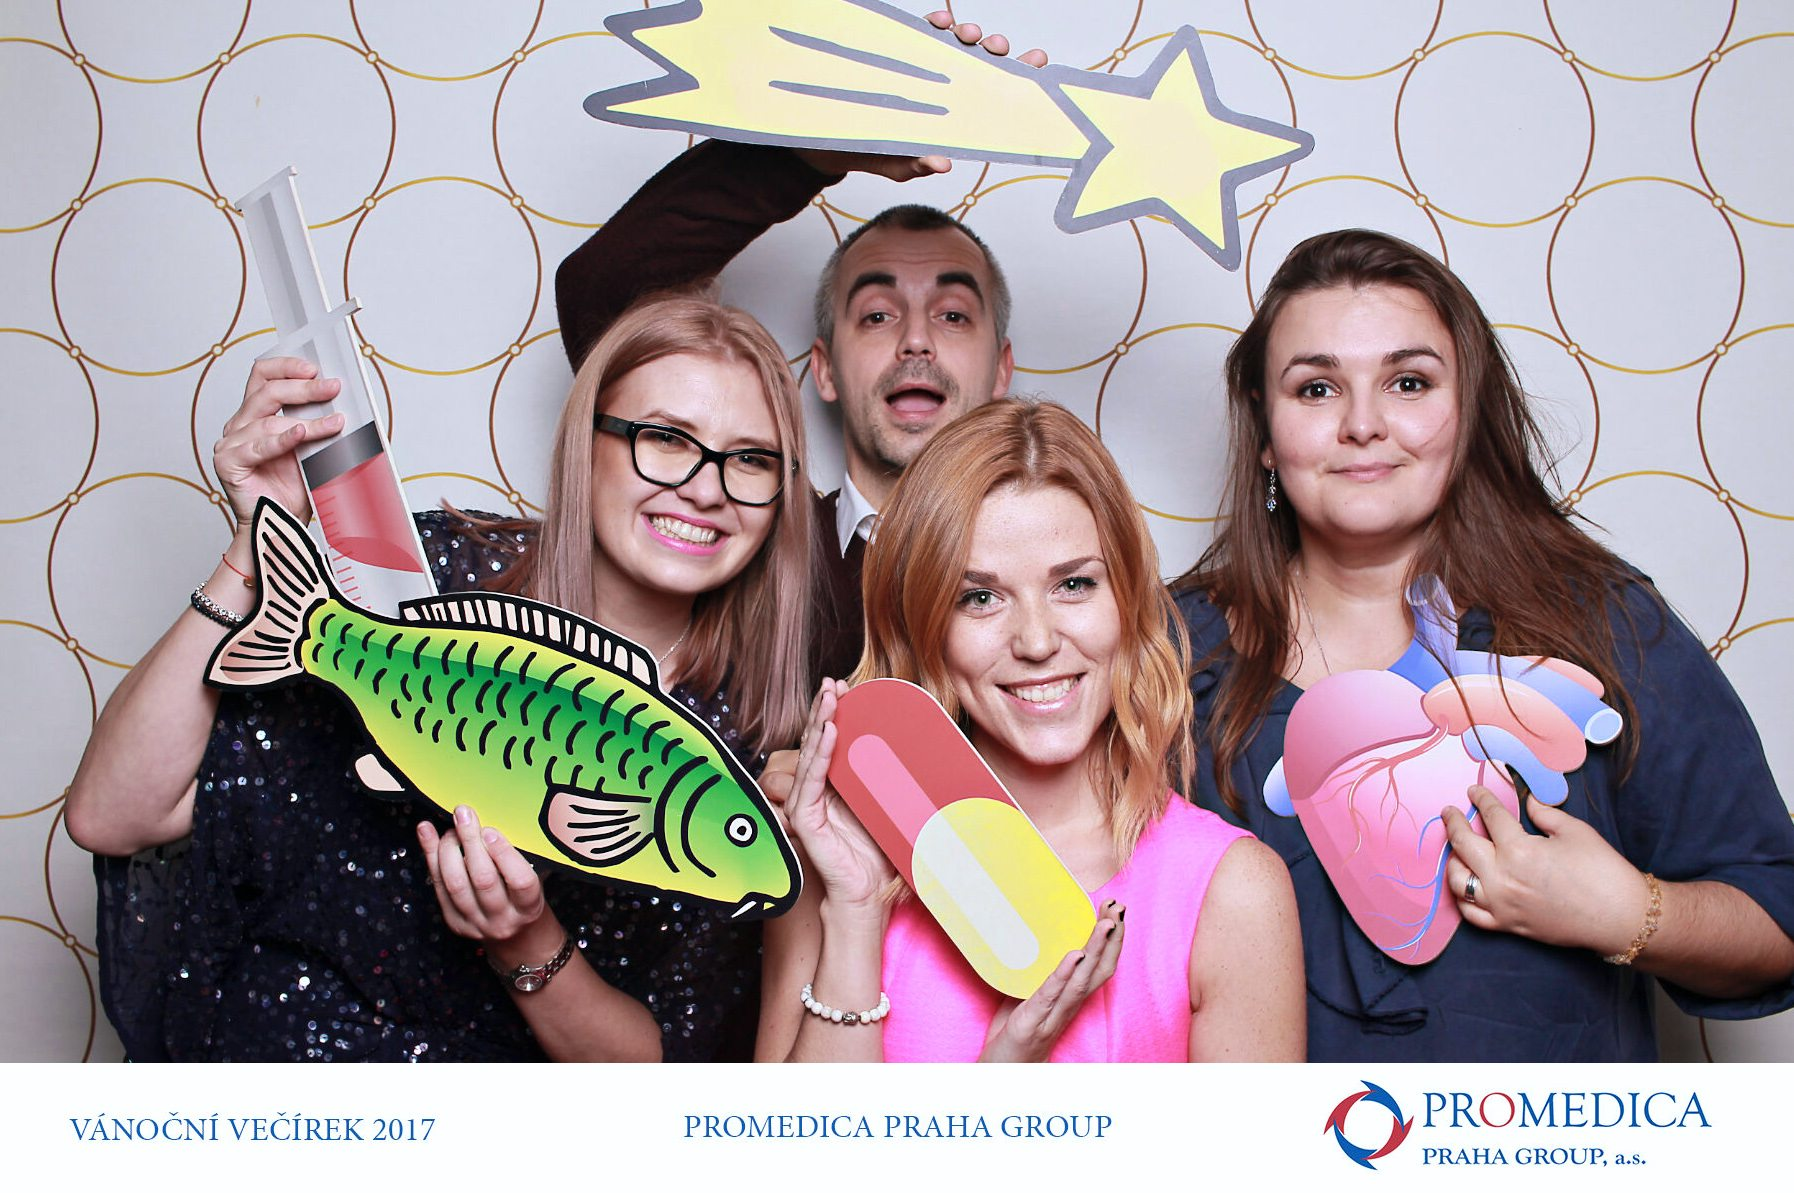 fotokoutek-promedica-praha-group-vanocni-vecirek-8-12-2017-354331